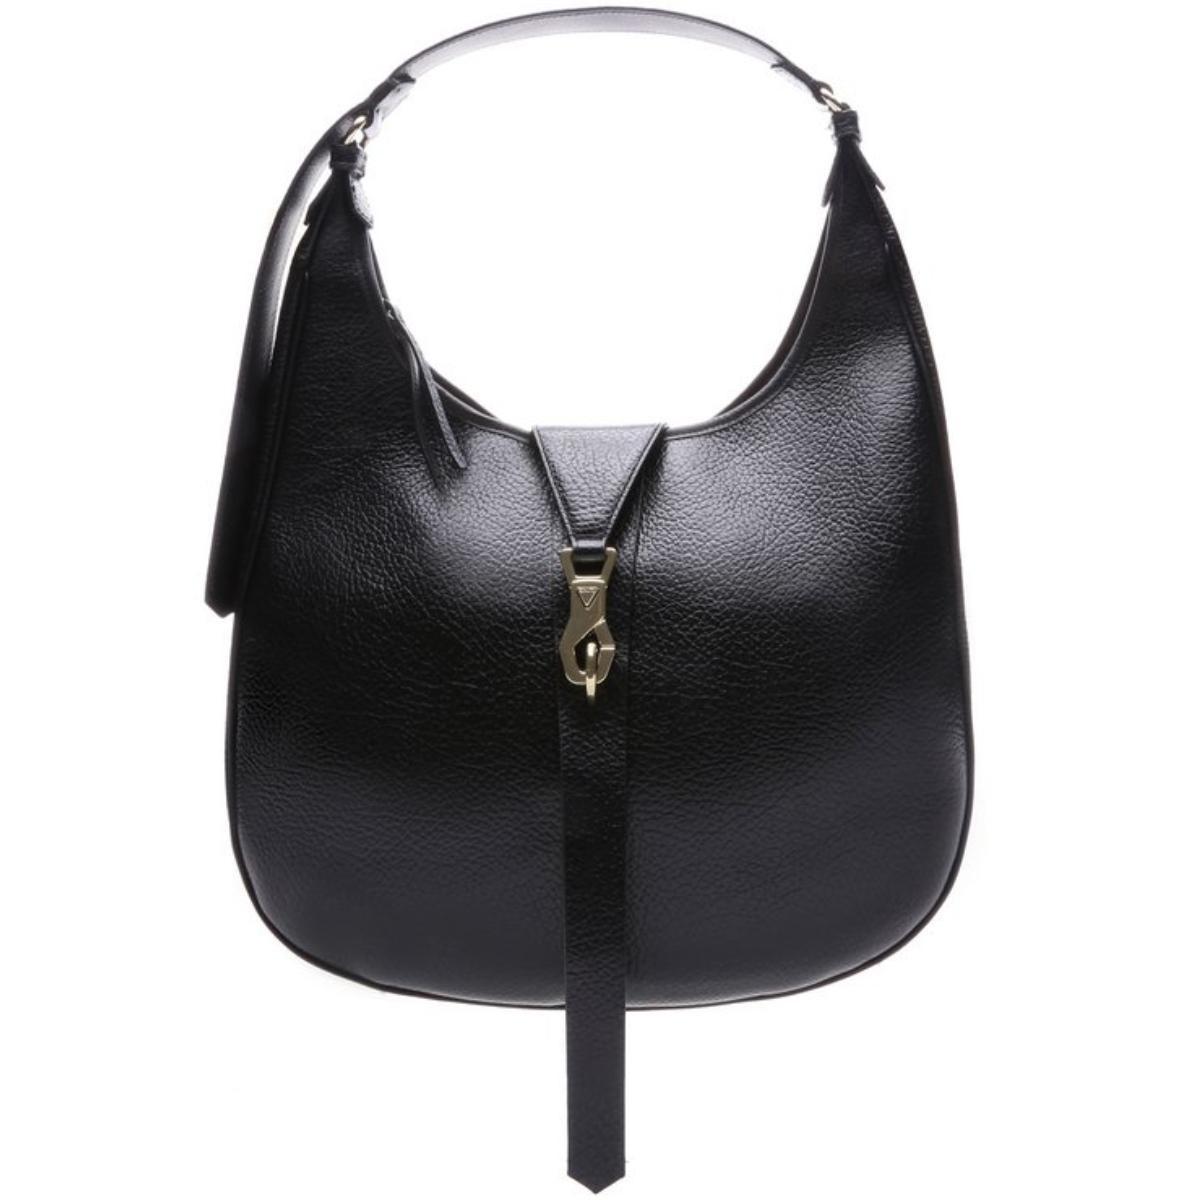 Bolsa Maxi Hobo Bag Berta Black - Schutz